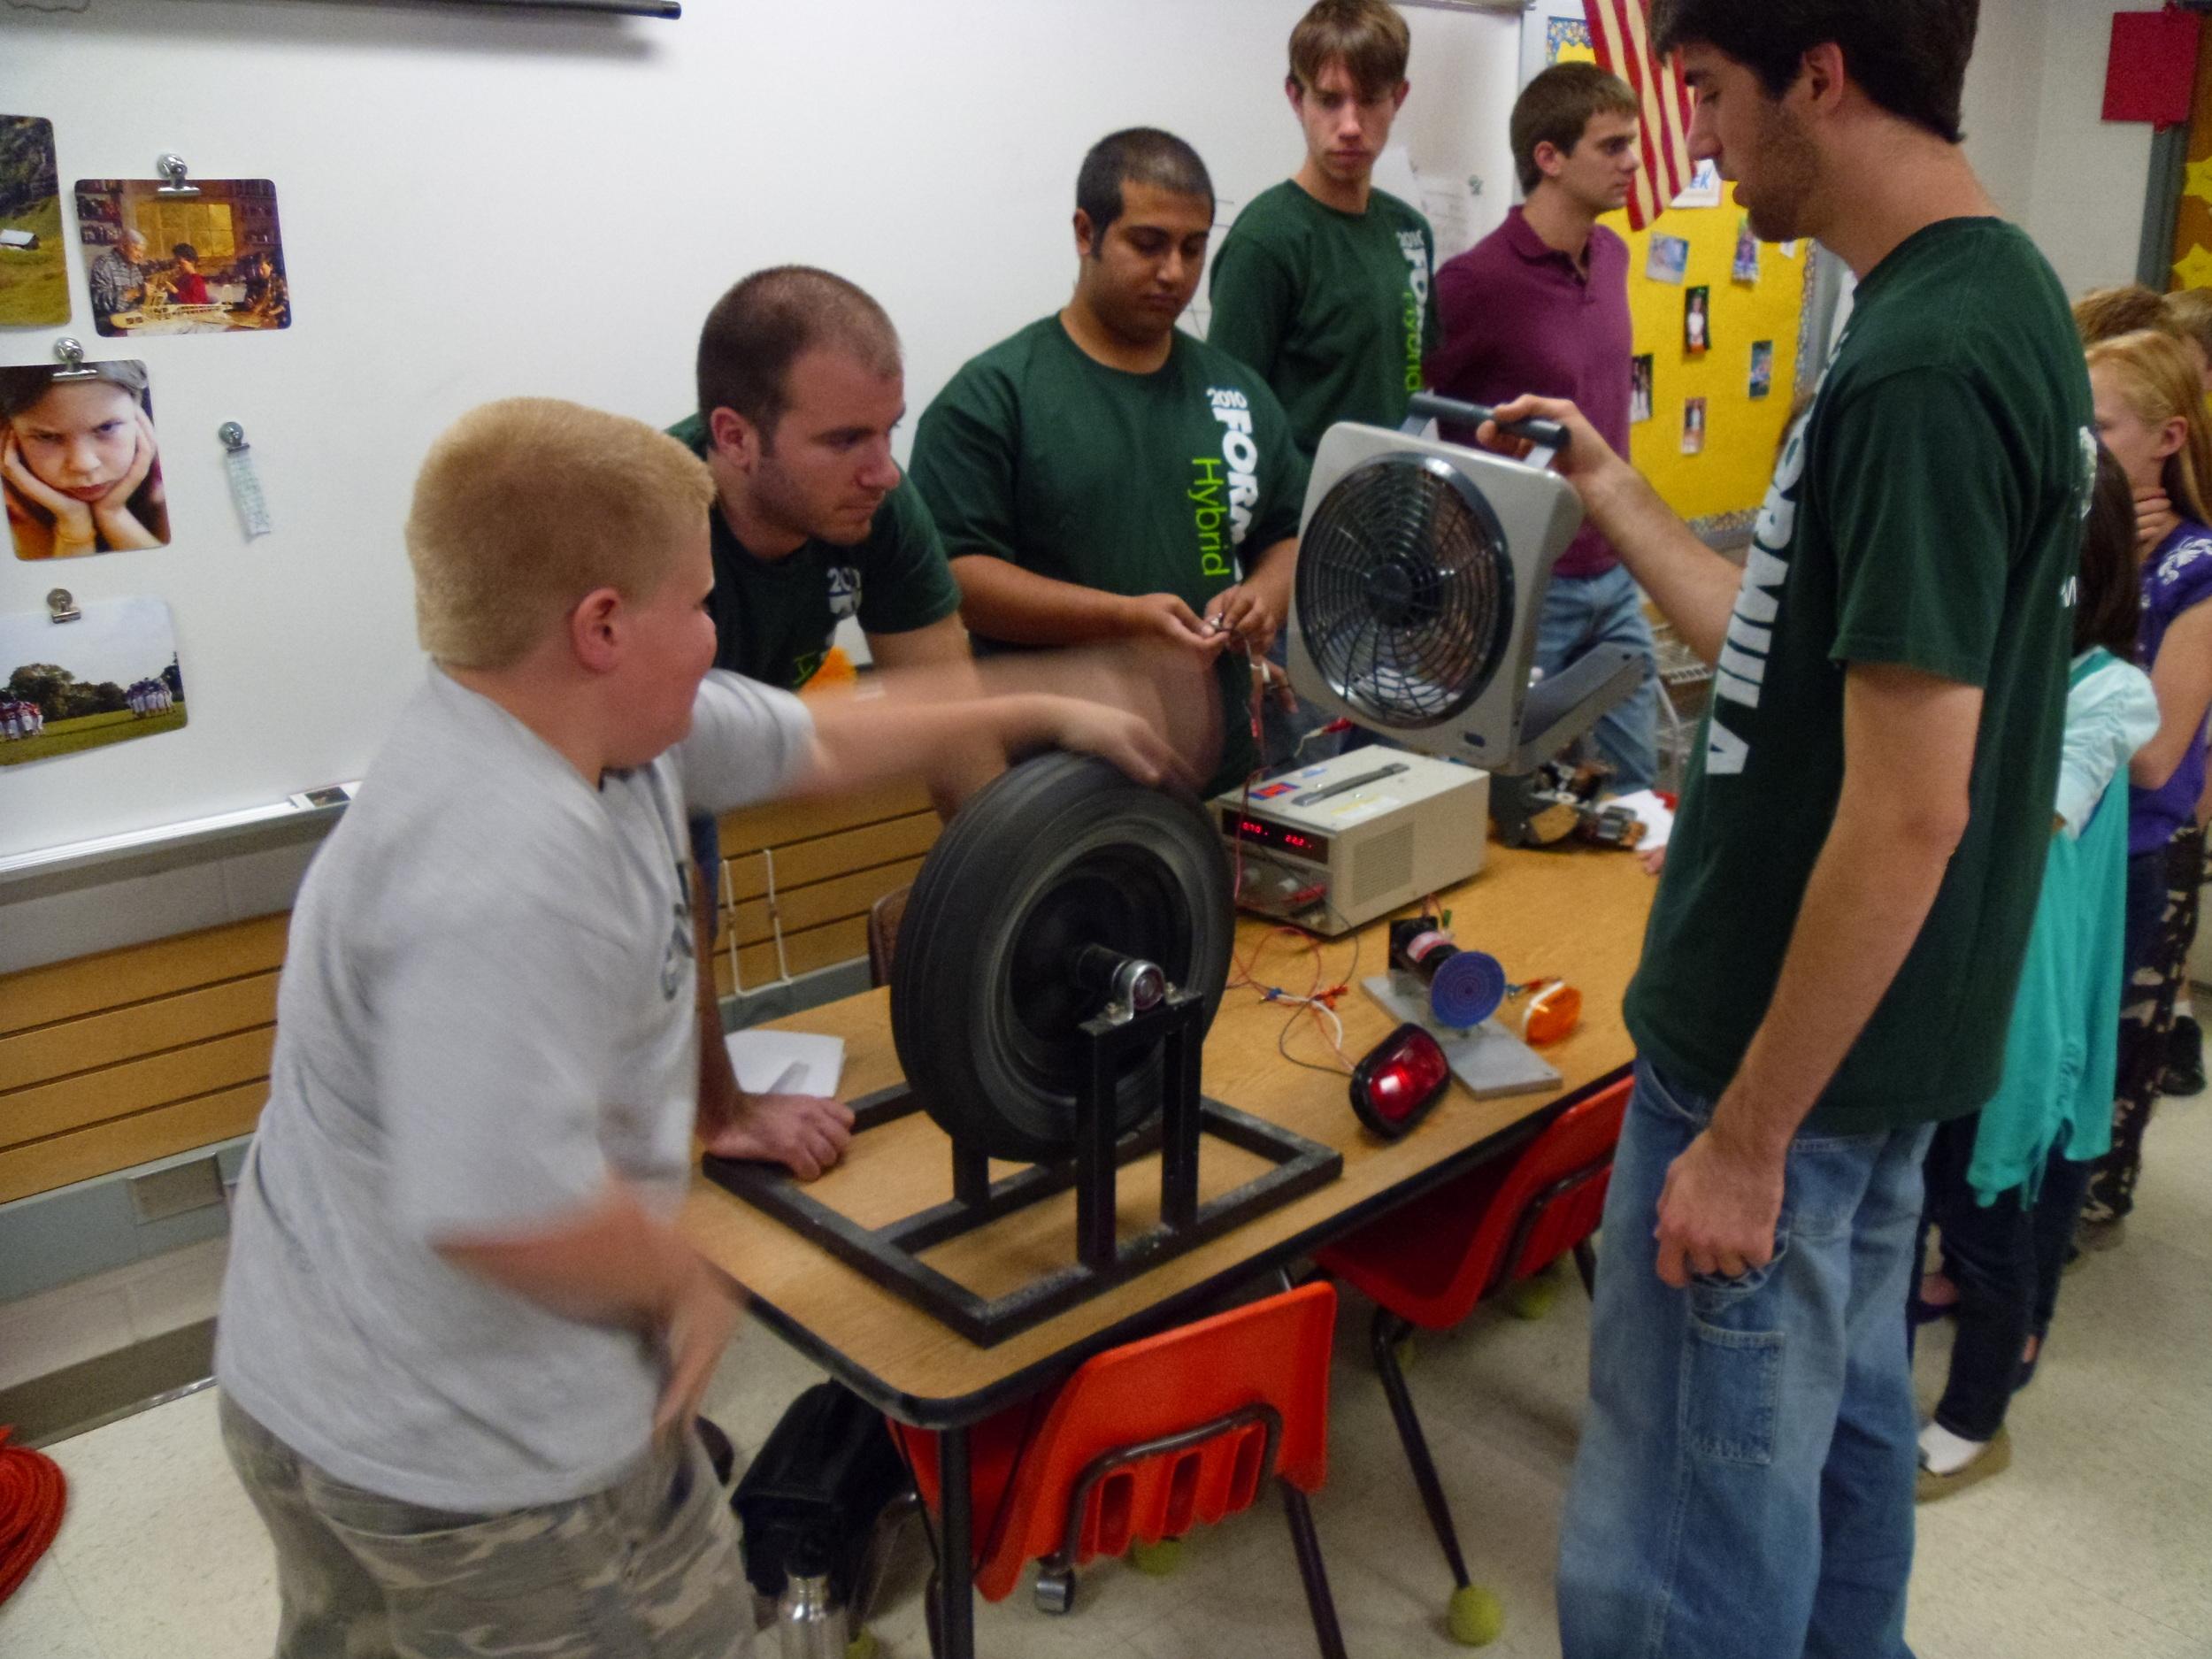 Teaching kids about energy and regenerative braking